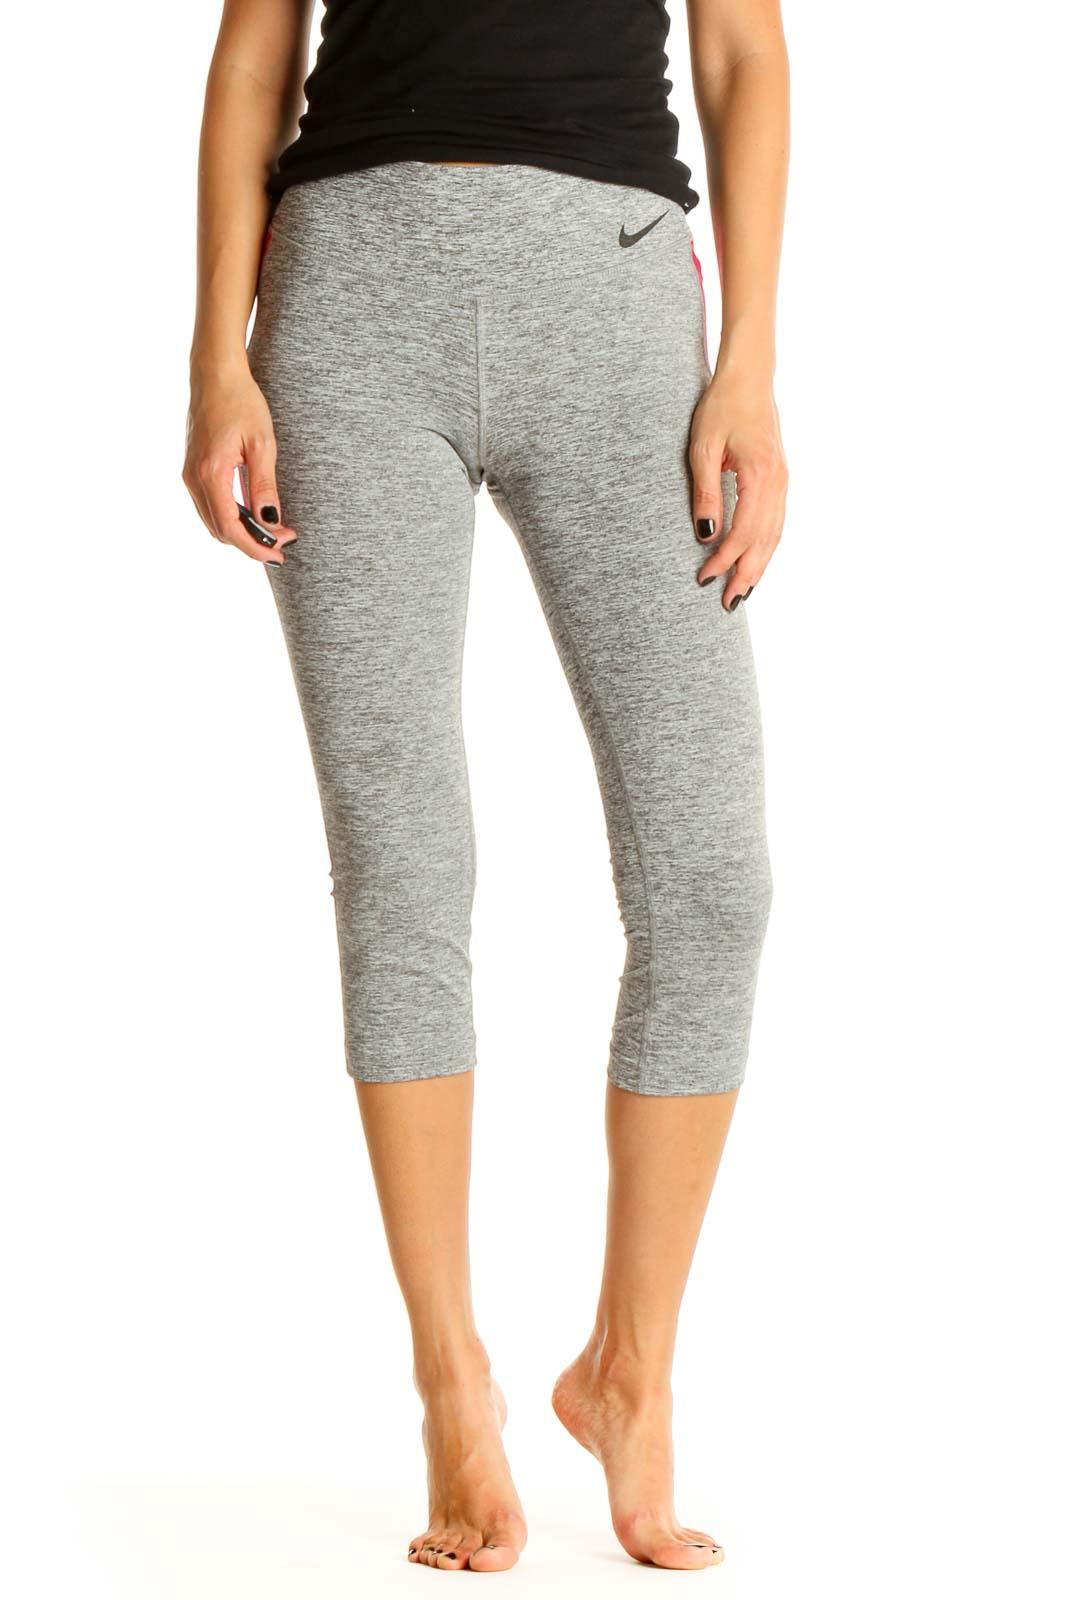 Gray Activewear Leggings Front